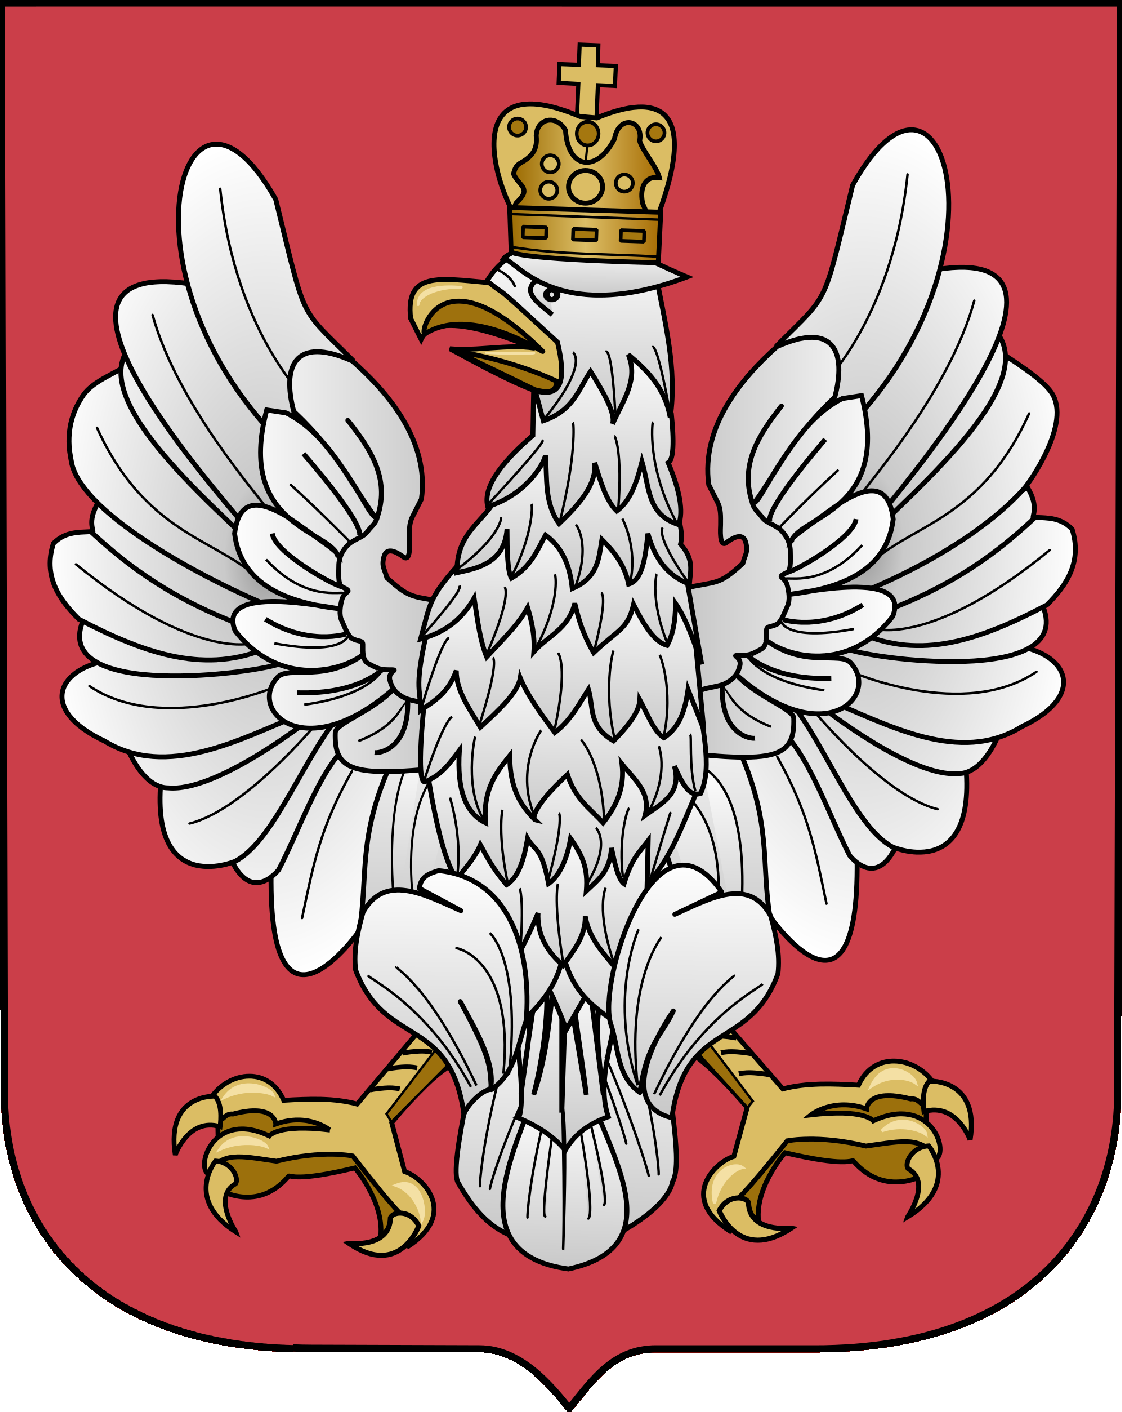 Coat of Arms of Polish Kingdom